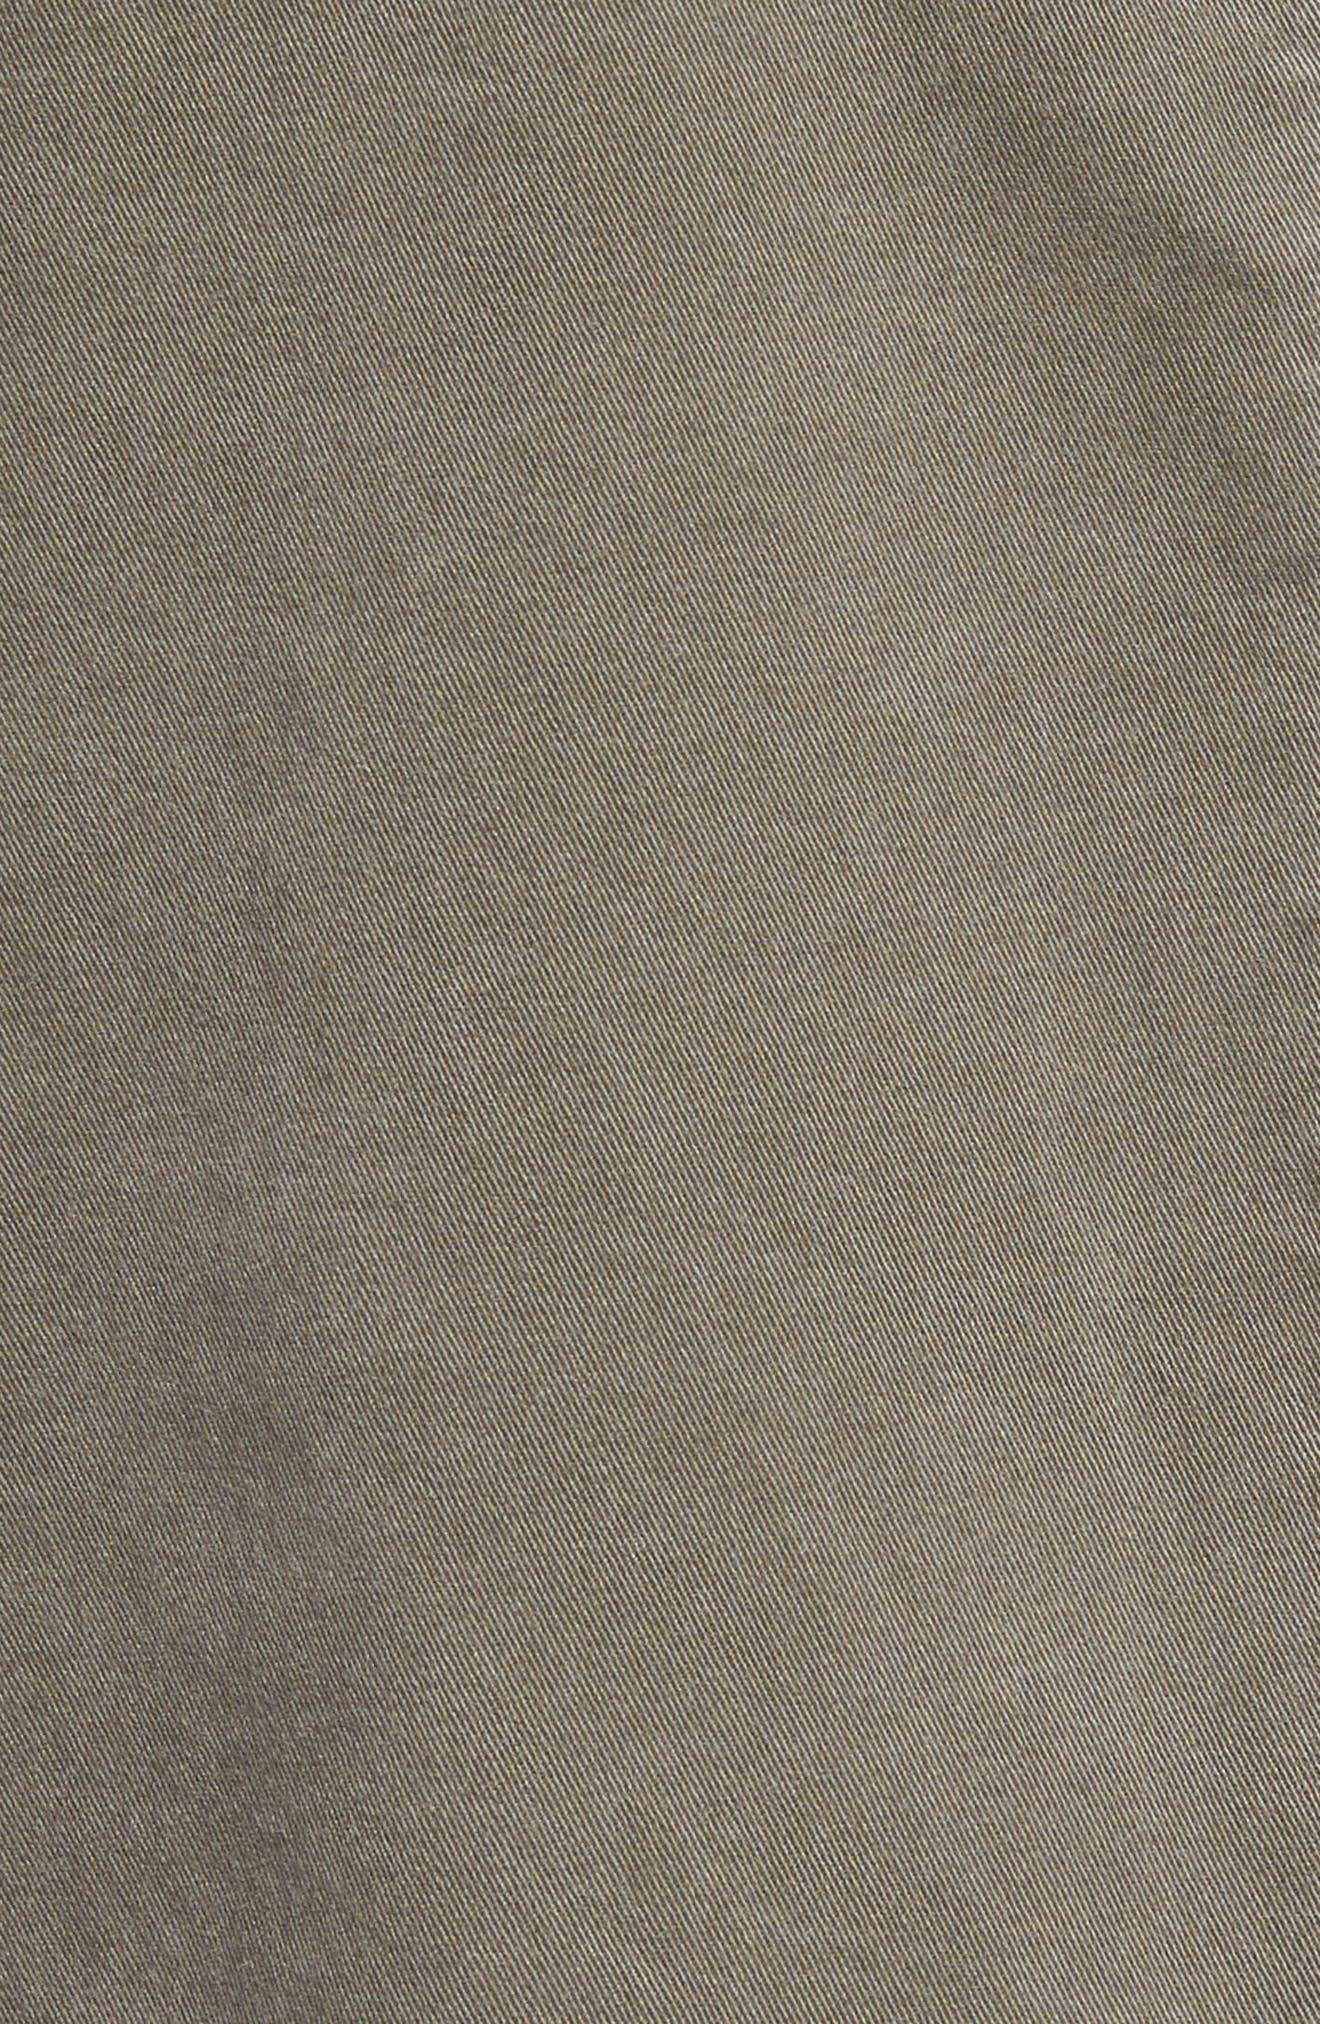 Sea Glass Shirt Jacket,                             Alternate thumbnail 6, color,